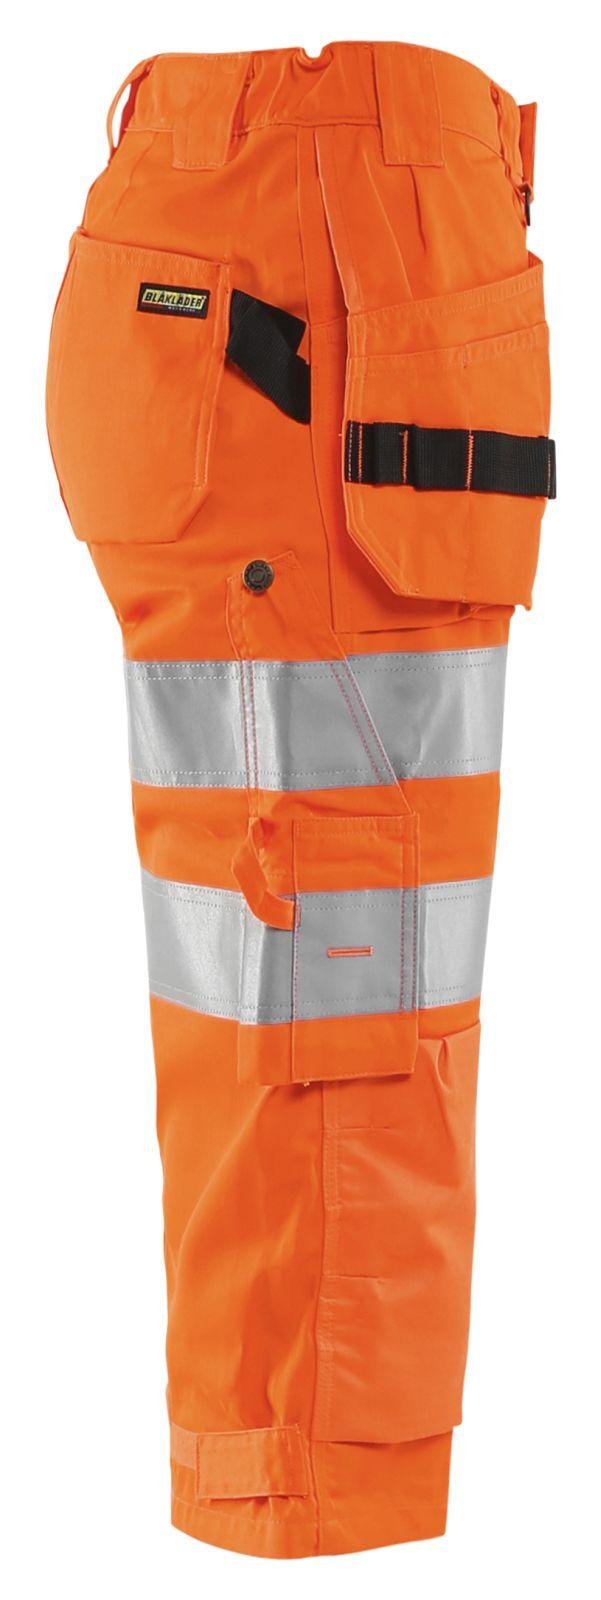 Blaklader Dames piraatbroeken 71391811 High Vis oranje(5300)